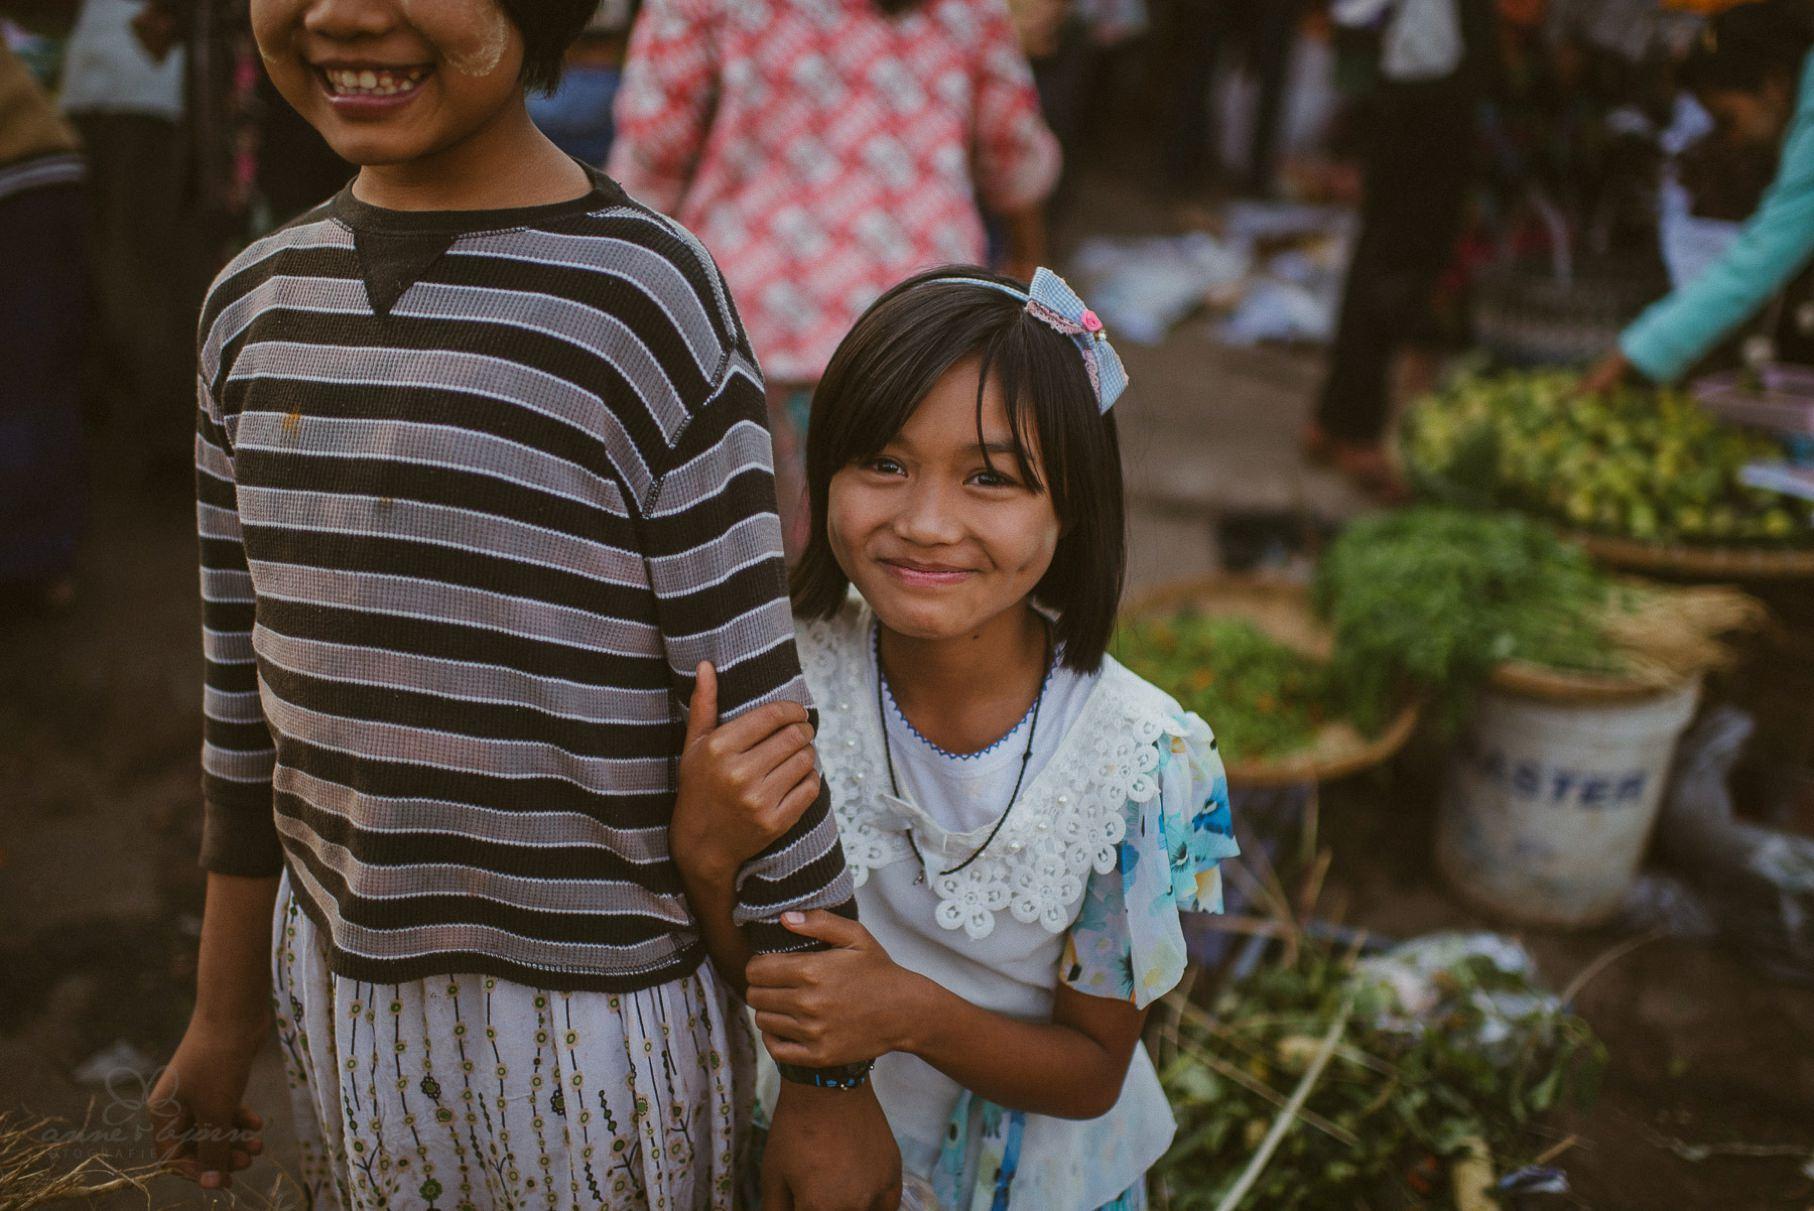 0070 yangon mandalay d76 7241 - Großstädte Myanmars - Yangon & Mandalay